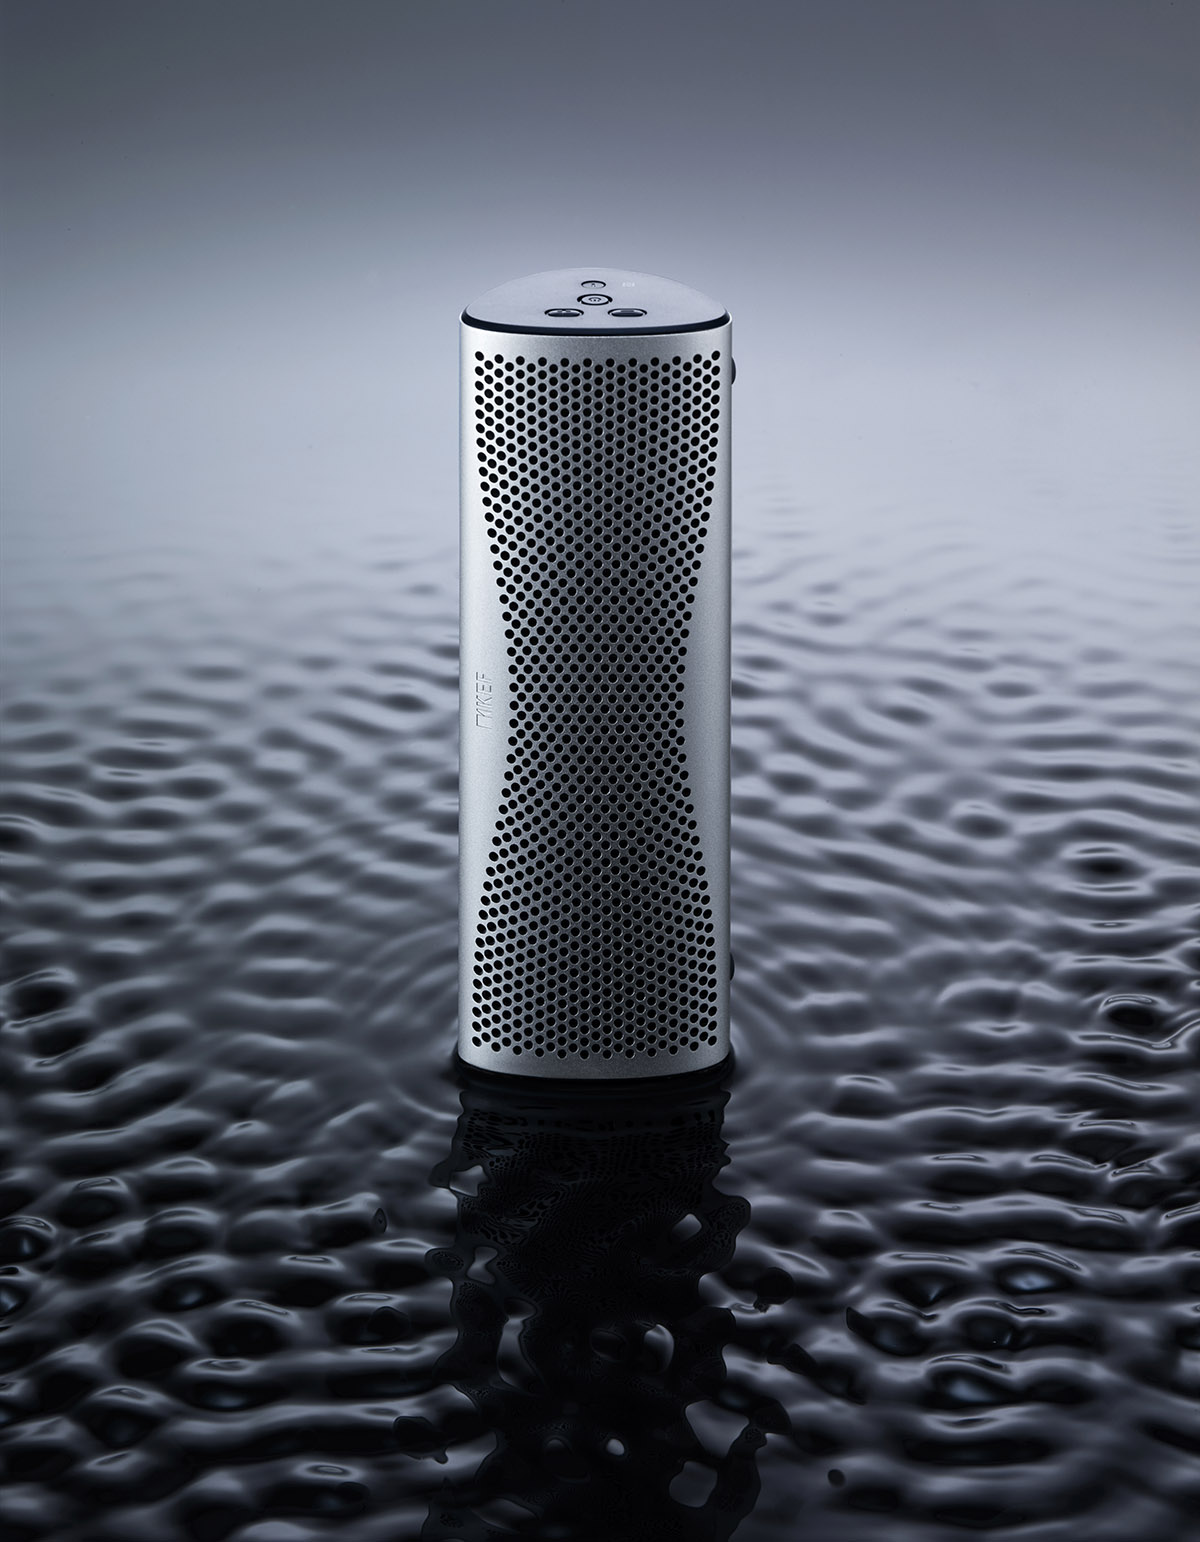 kef-muo-speaker-ross-lovegrove-computational-design-andrea-locatelli-04.jpg